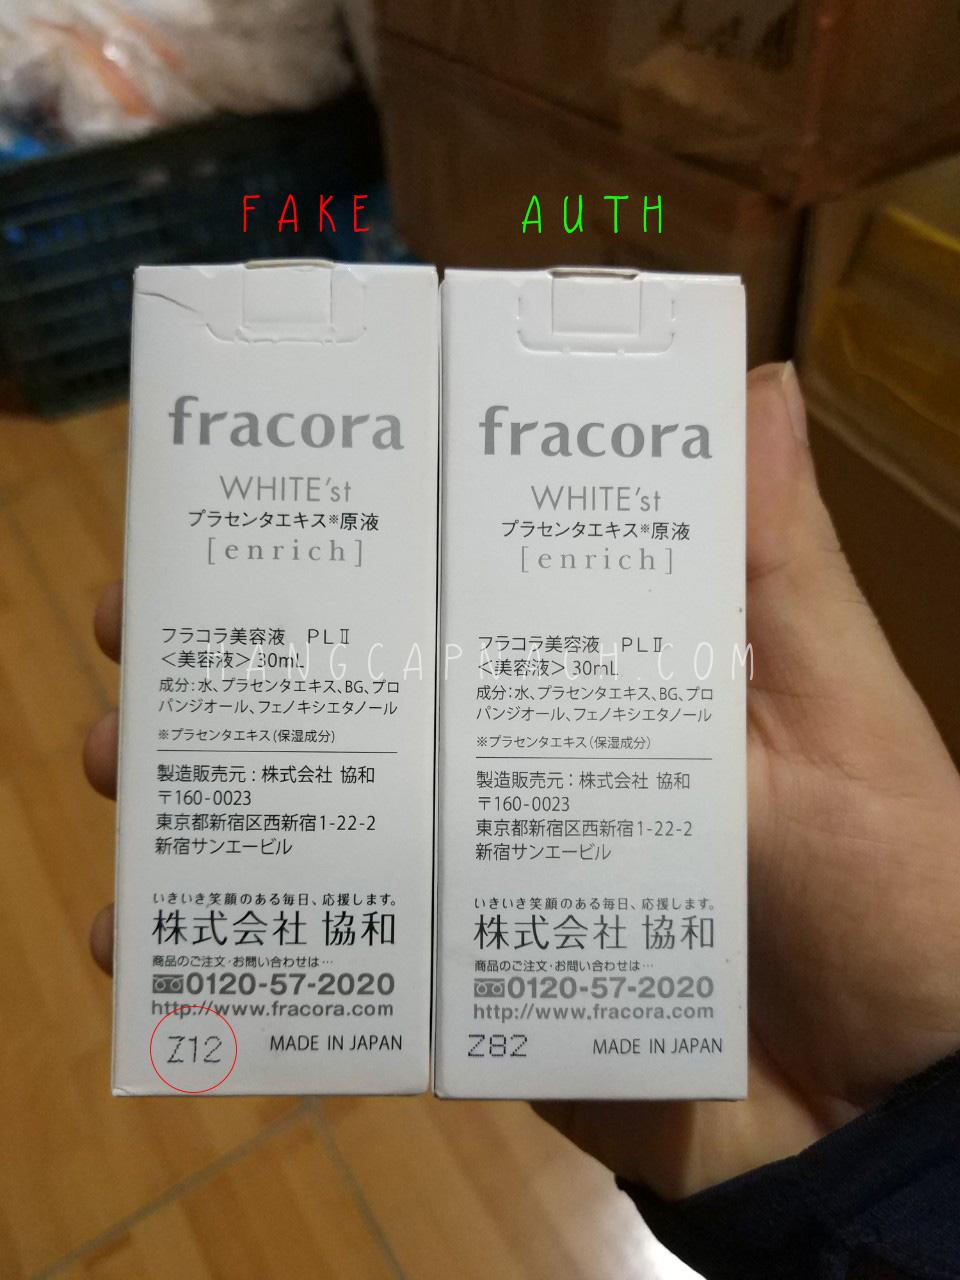 Fracora Enrich fake 2